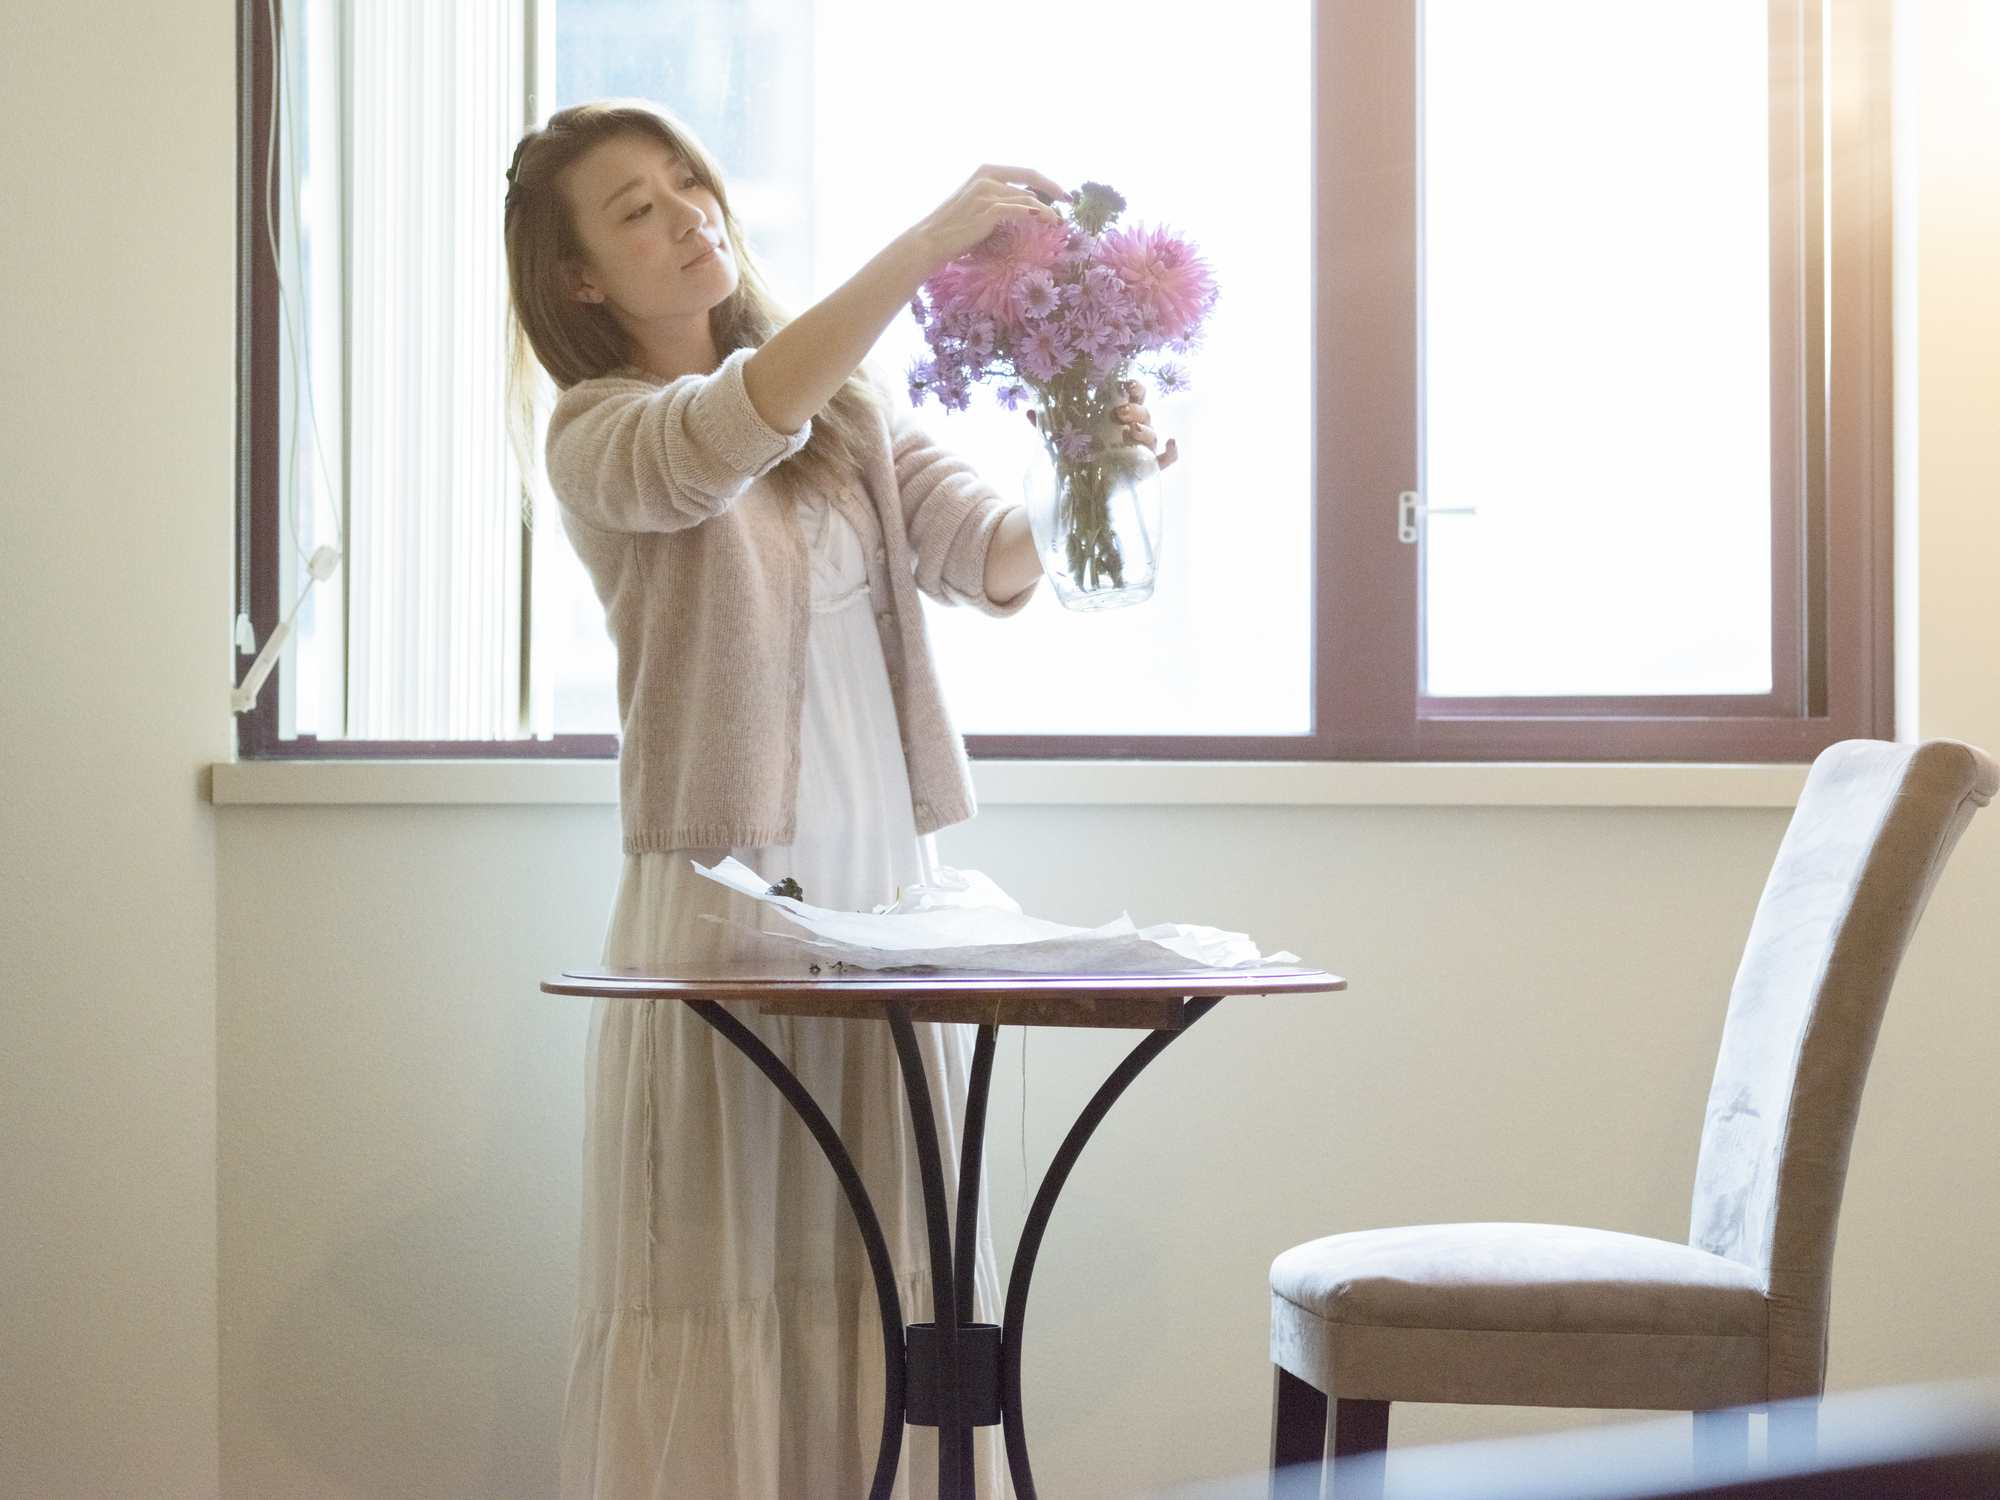 Woman arranging cut flowers